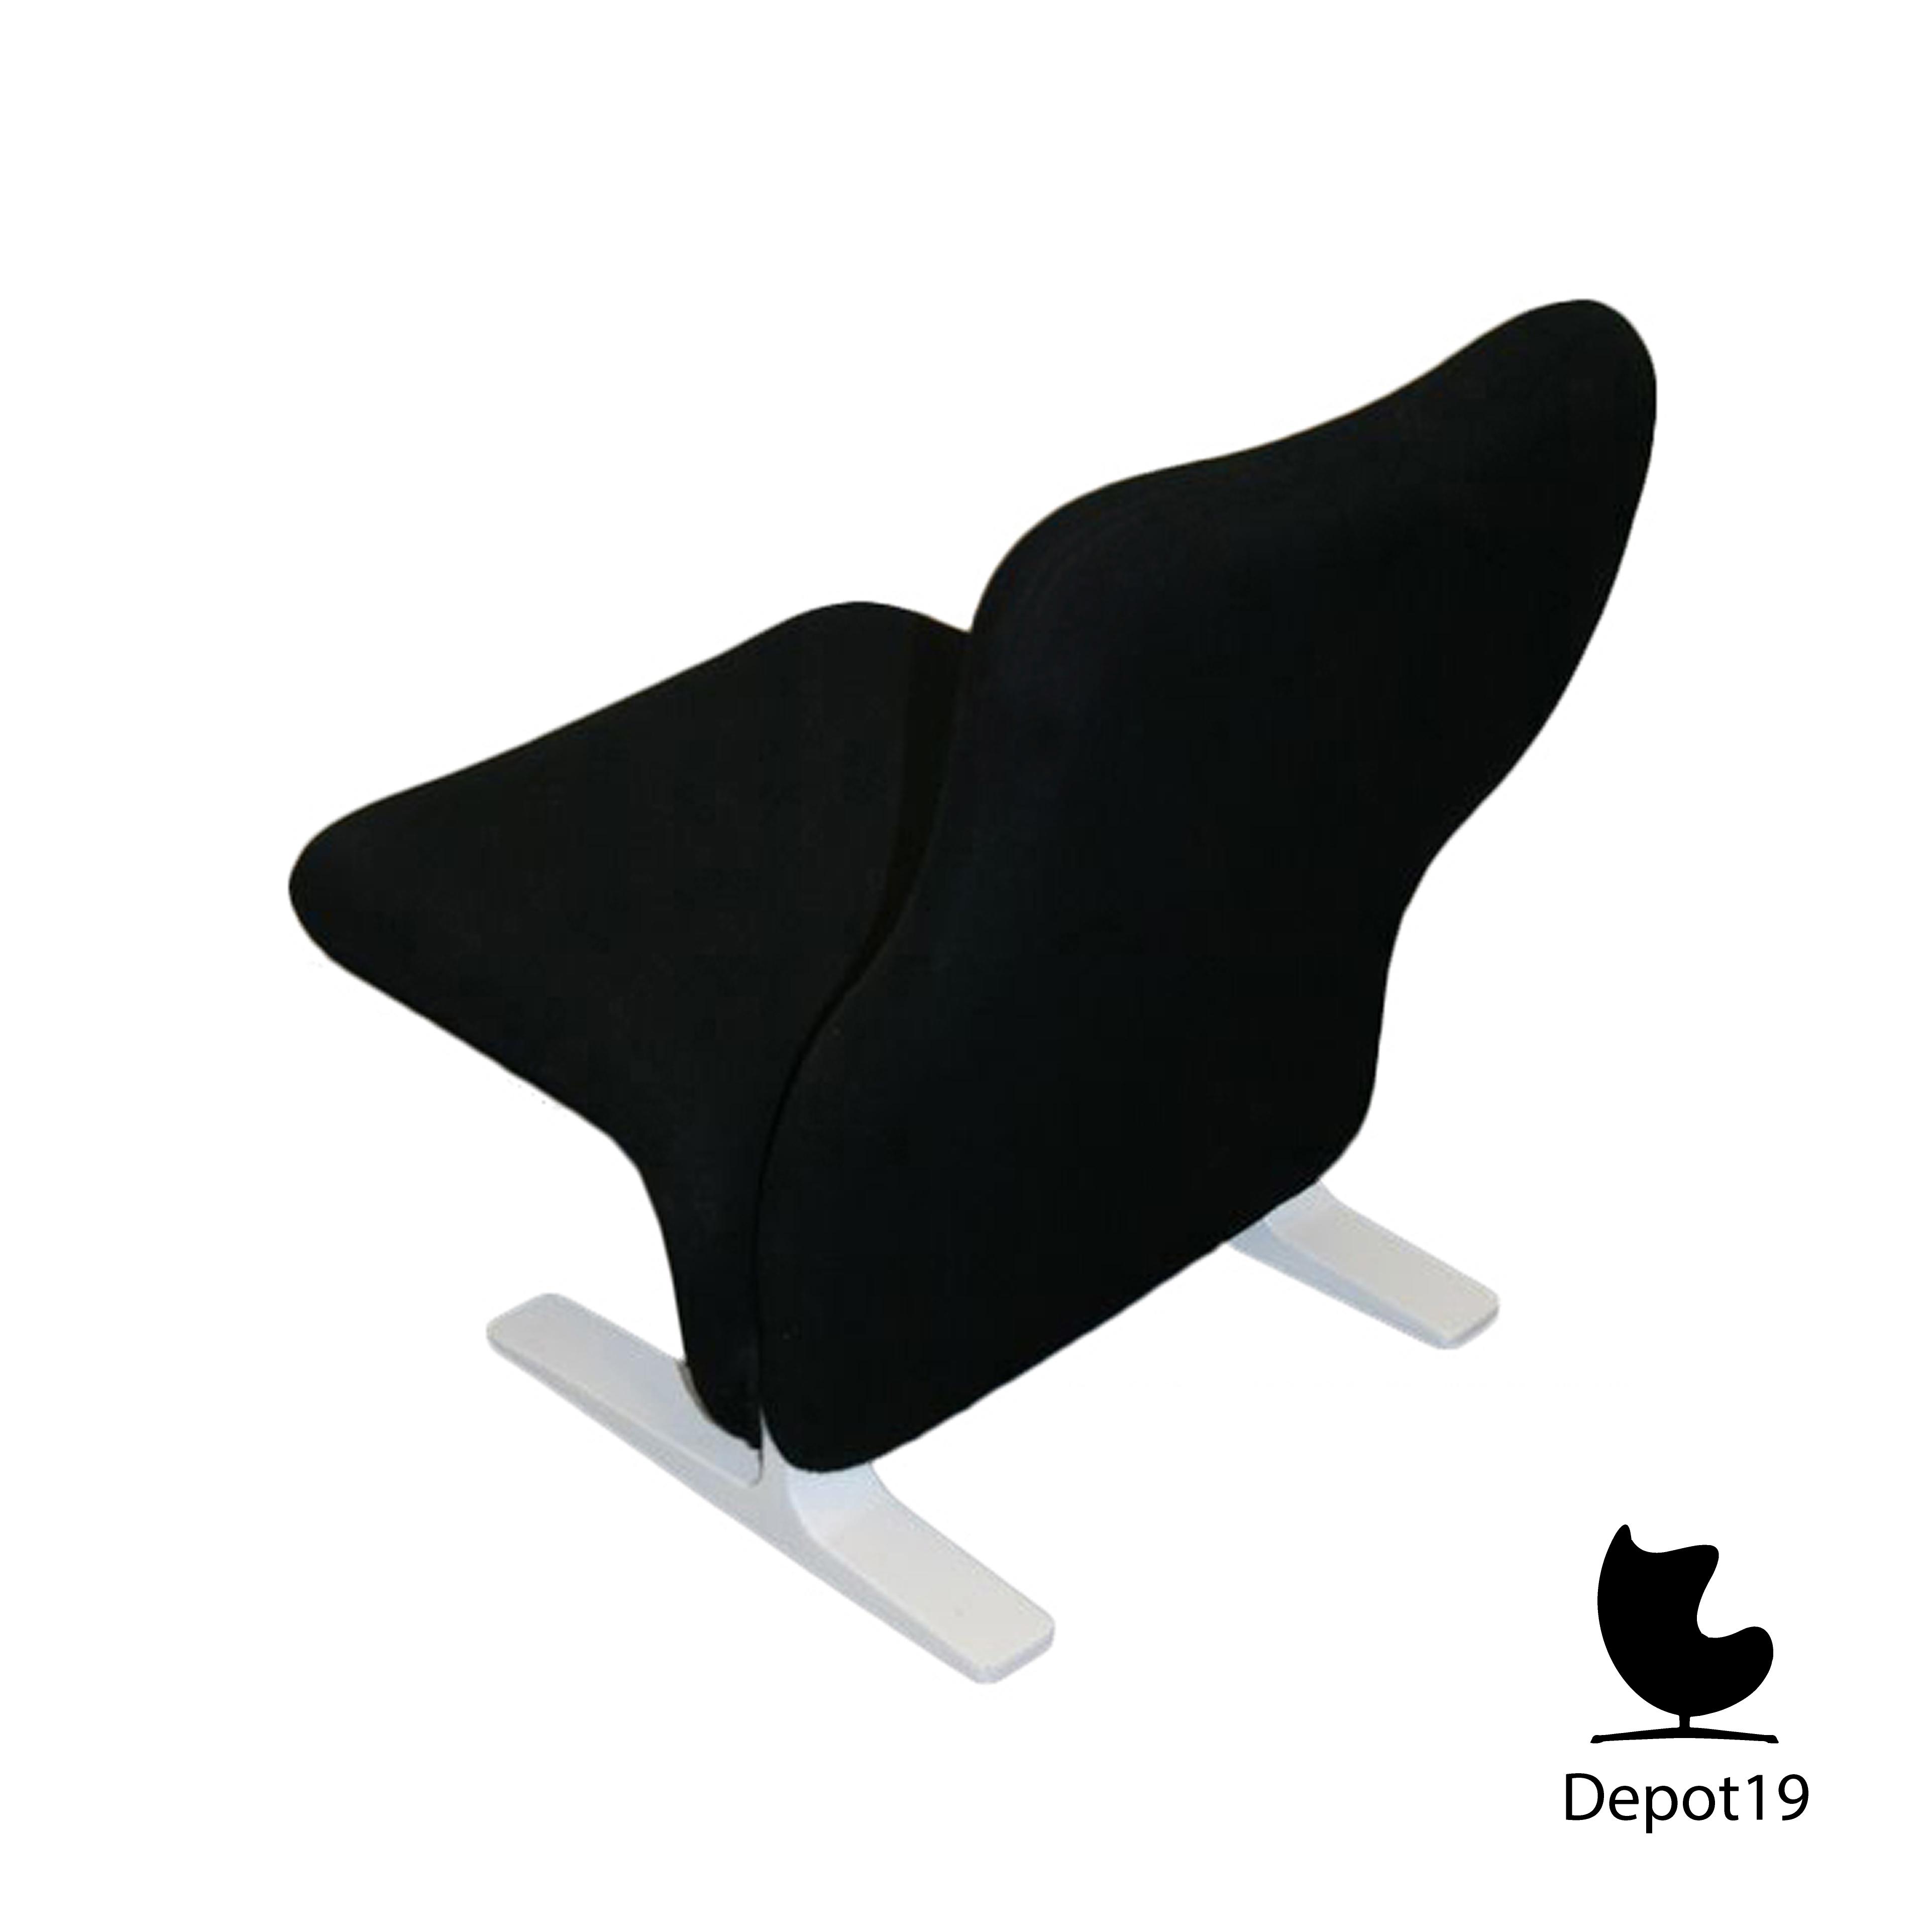 pierre paulin f780 artifort fauteuil zwart depot 19. Black Bedroom Furniture Sets. Home Design Ideas